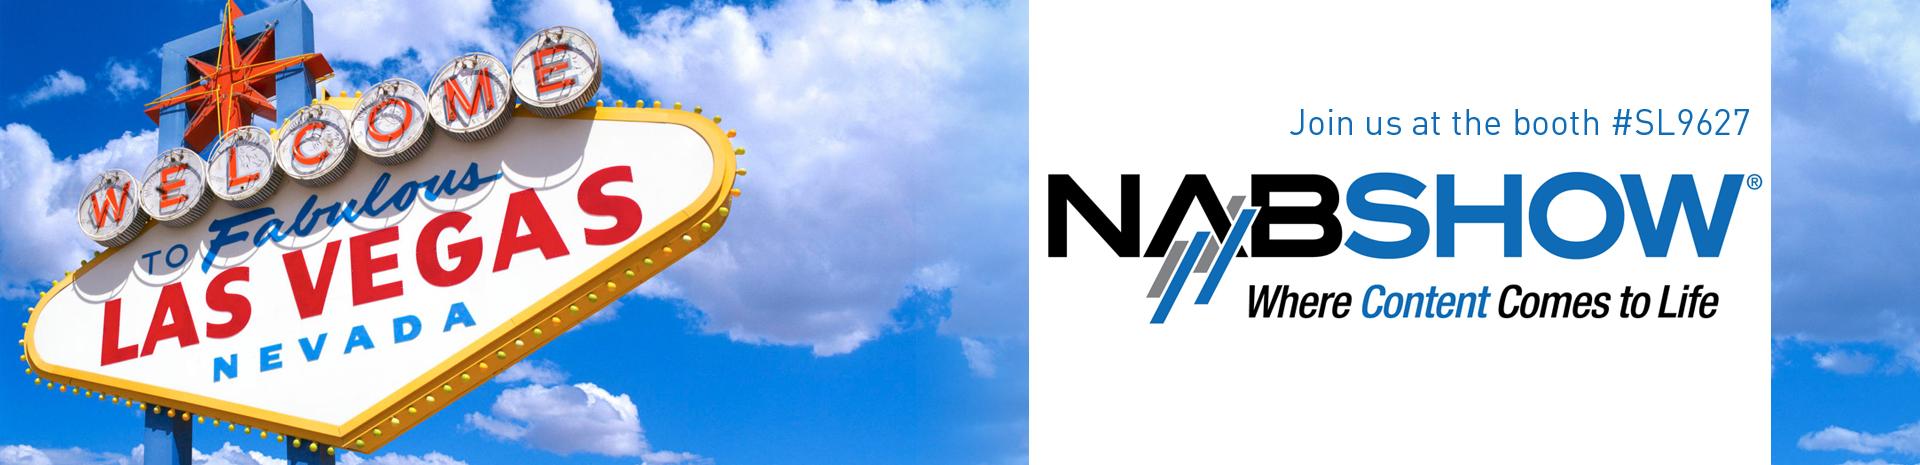 Join us at NAB Show, 13-16 April 2015 Las Vegas!